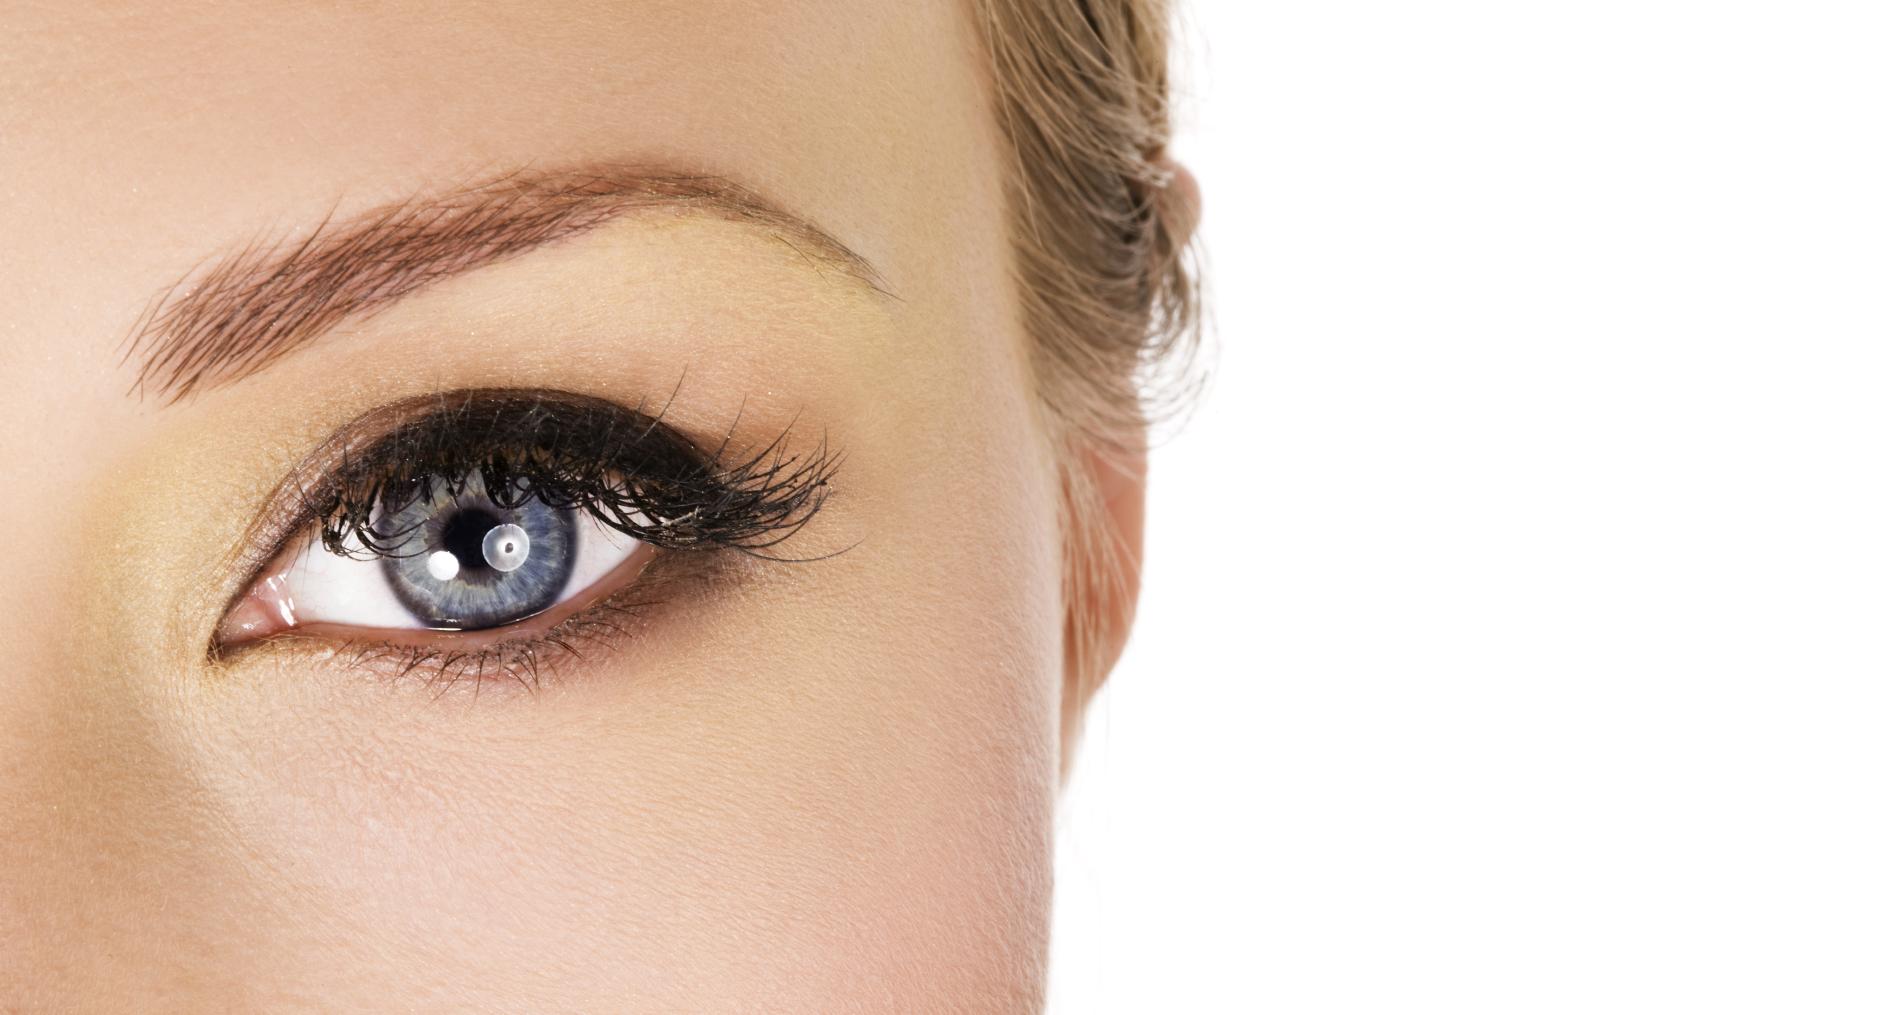 vision-testing-for-eyes